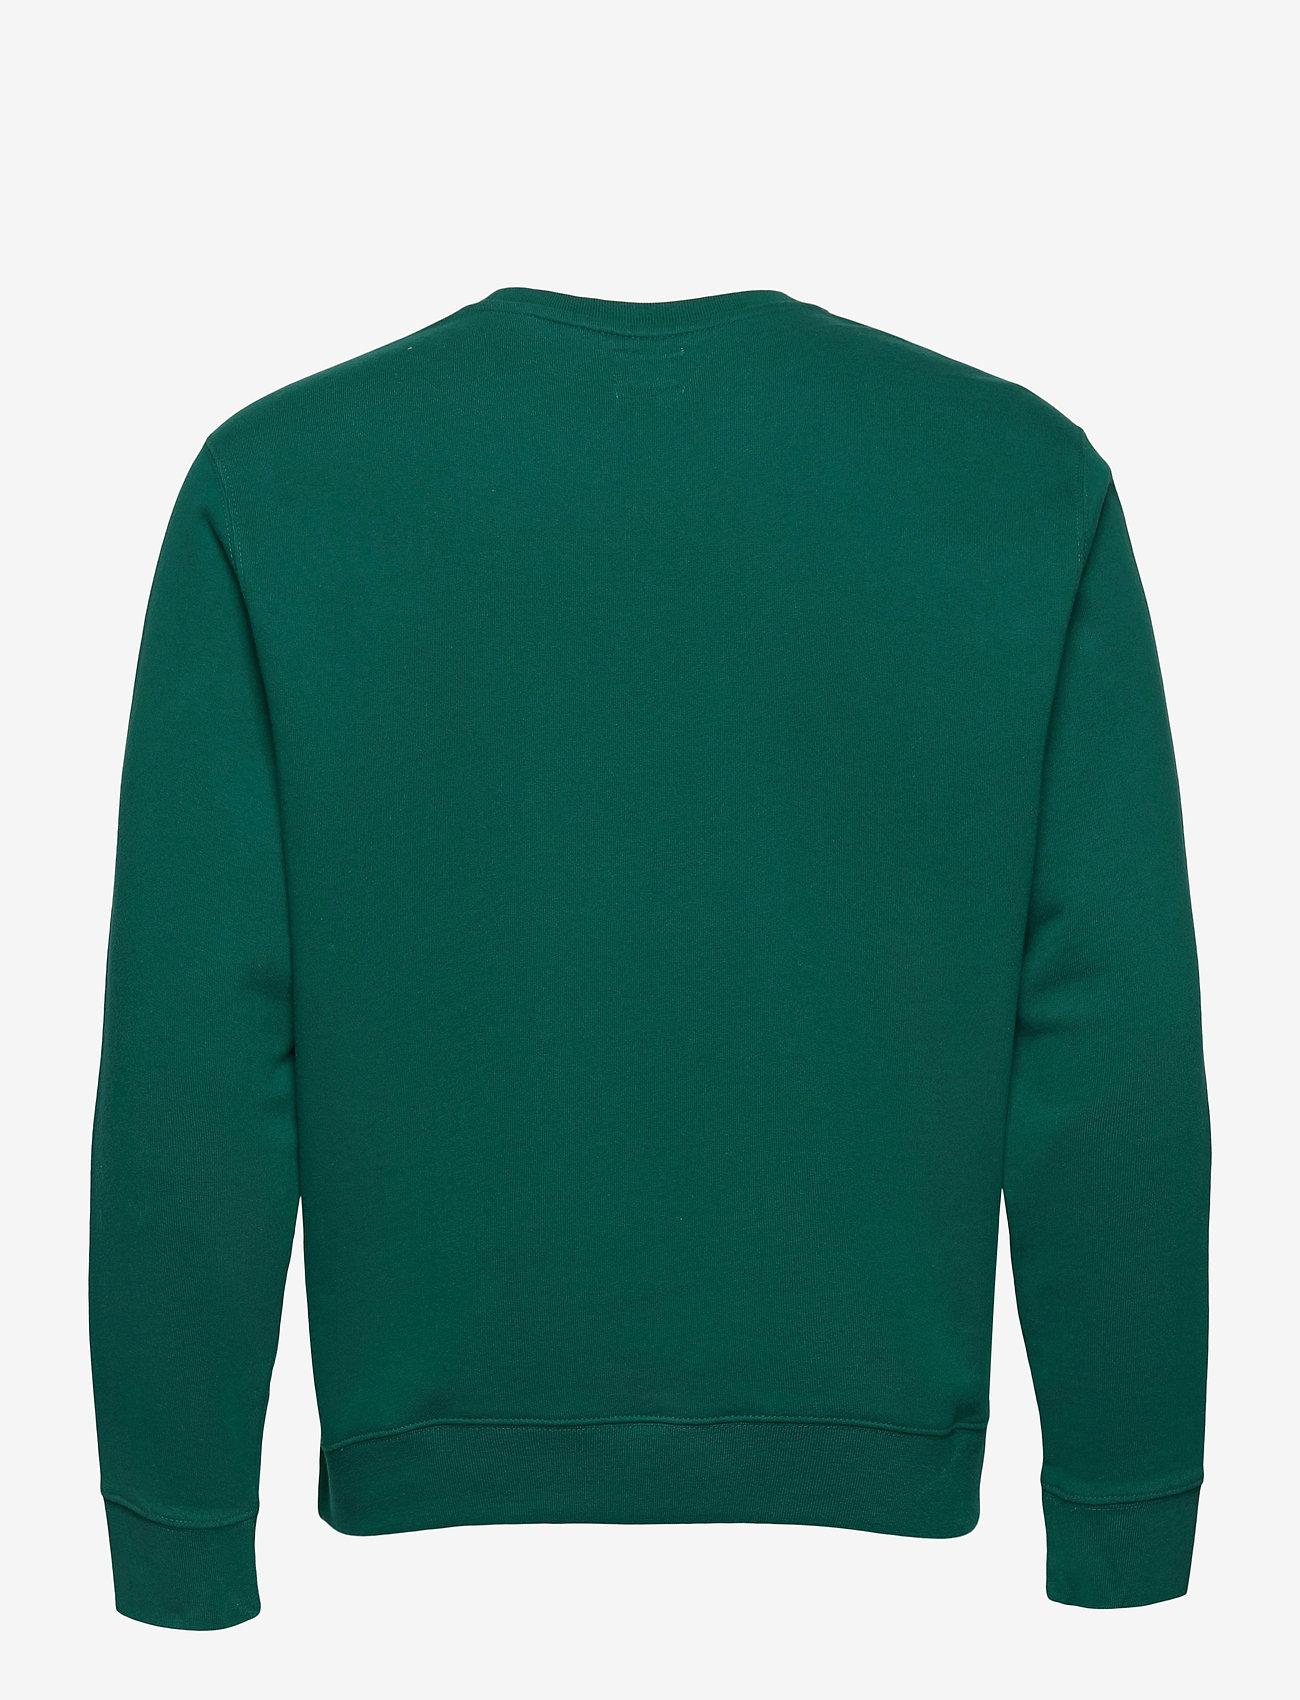 LEVI´S Men - NEW ORIGINAL CREW FOREST BIOME - basic sweatshirts - greens - 1